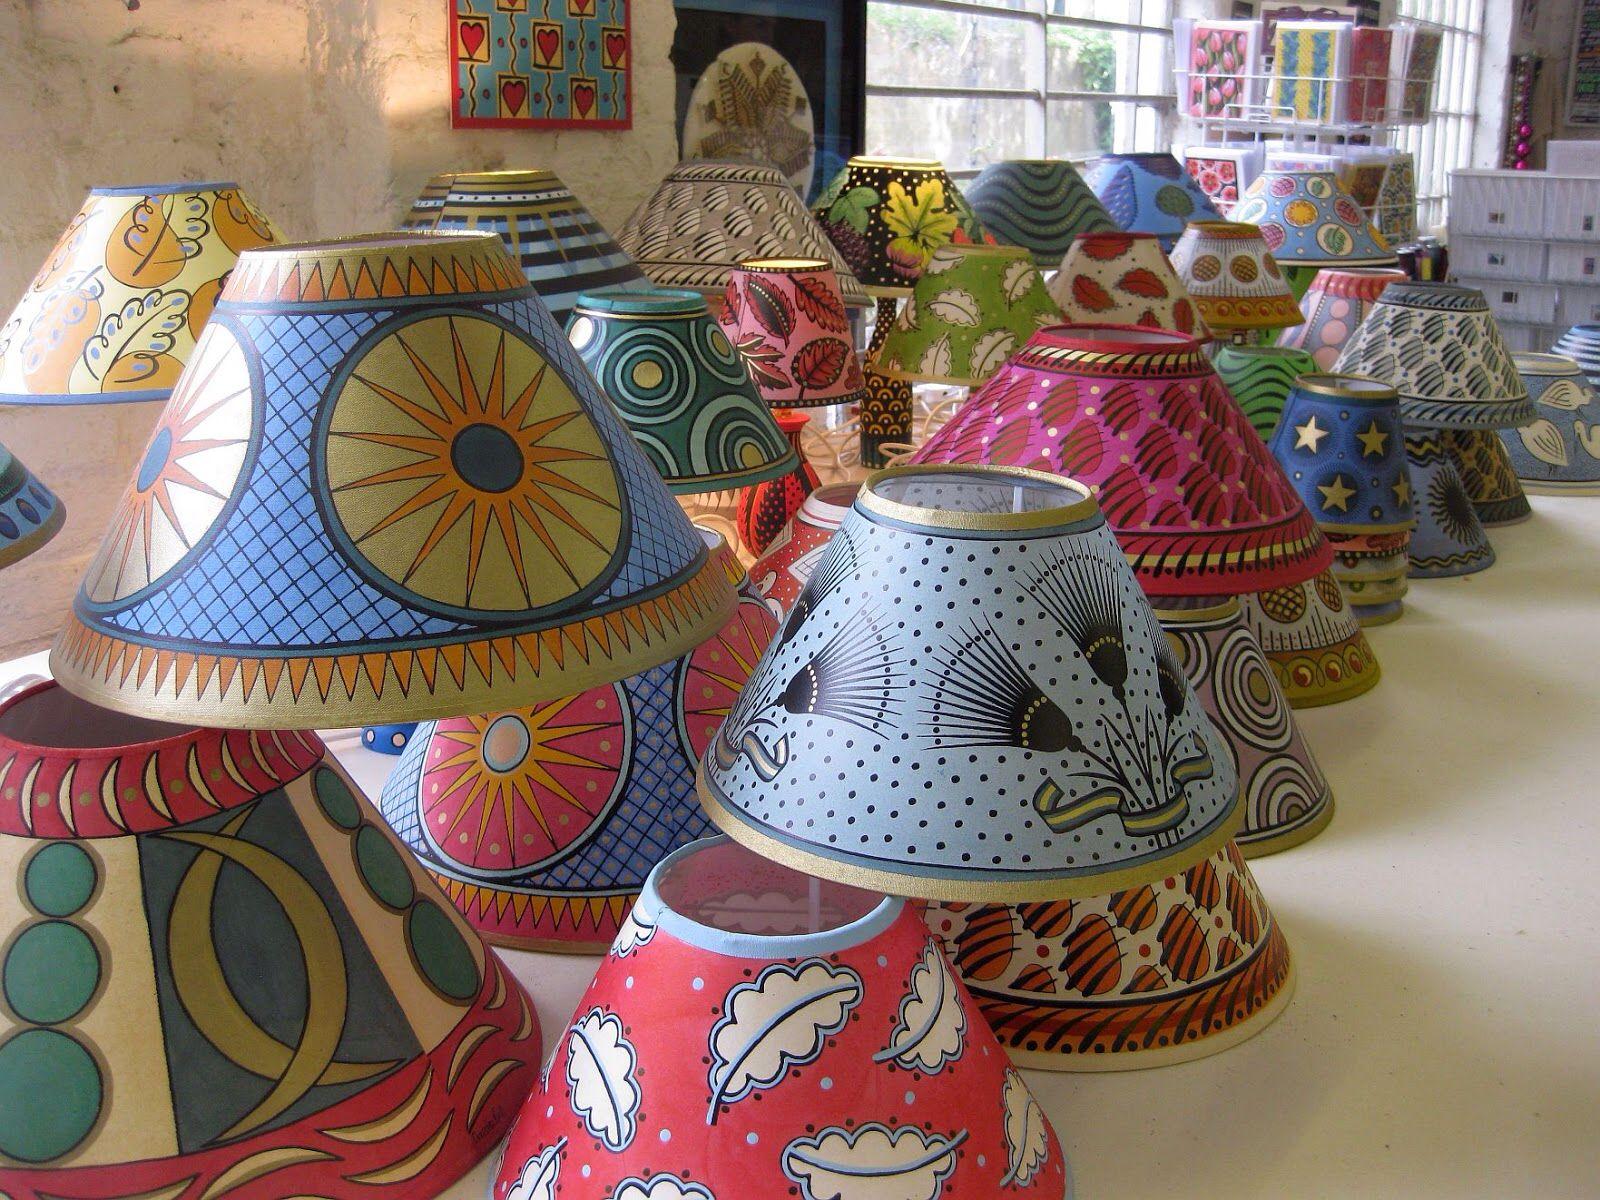 Cressida Bell Lampshades Lampshade Designs Colorful Lamps Cressida Bell